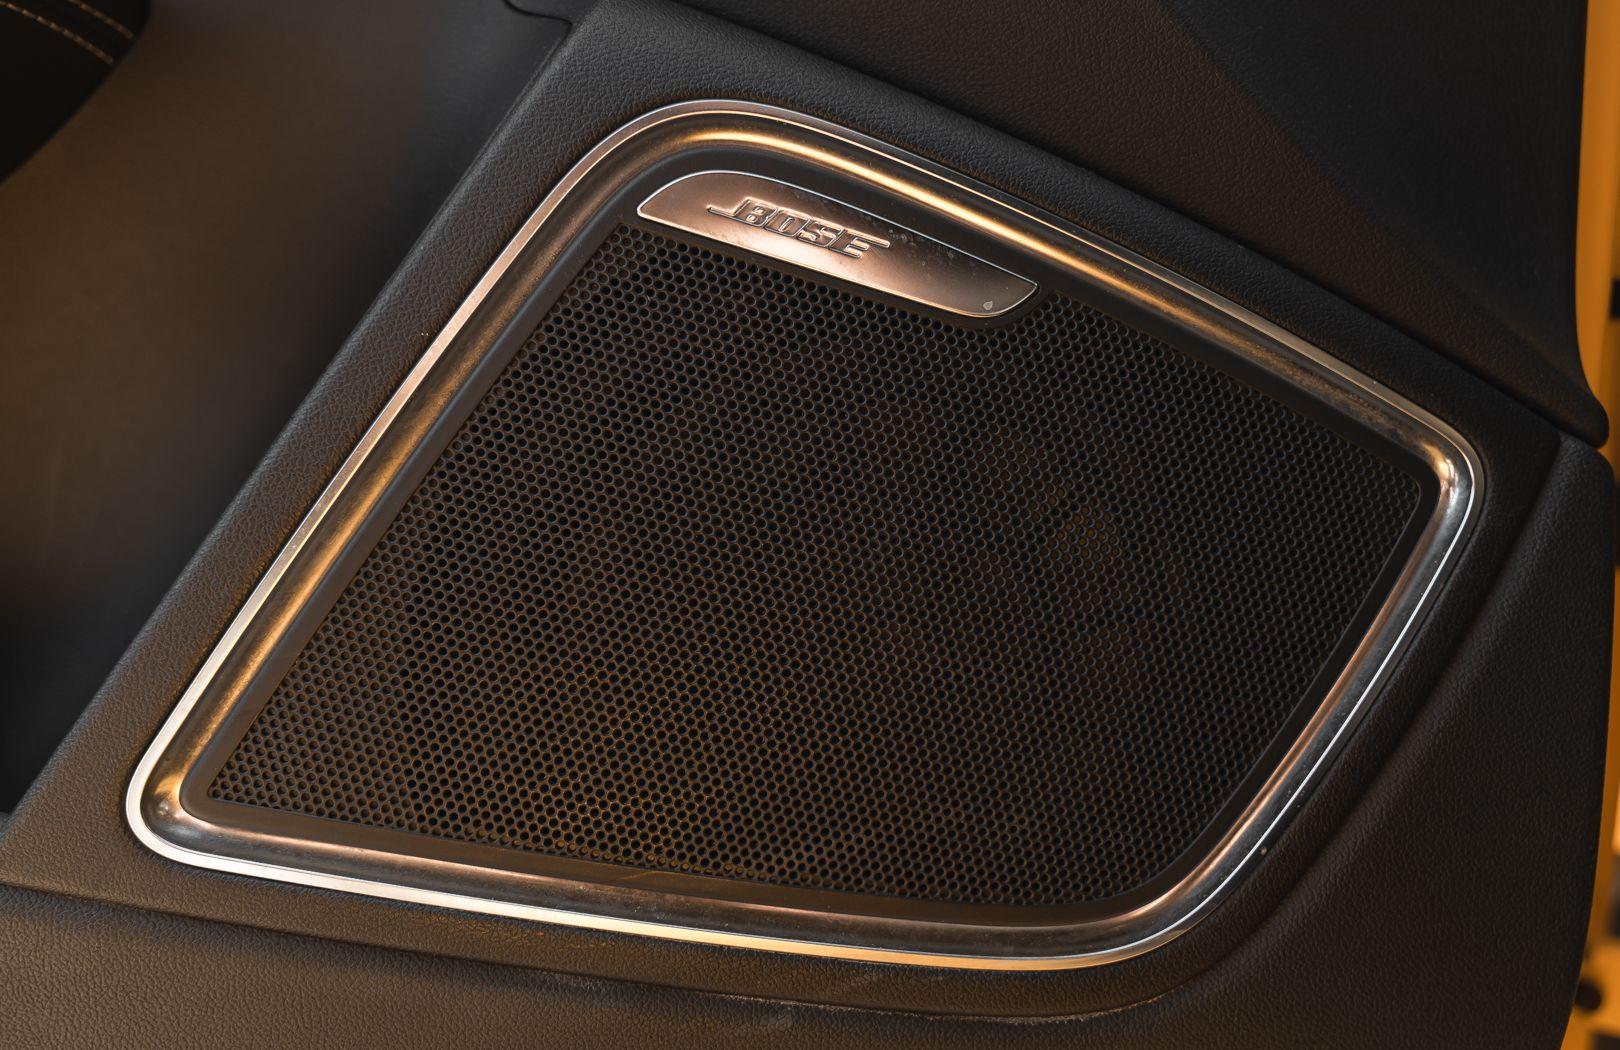 2014 Audi S1 Sportback 2.0 TFSI Quattro 83633